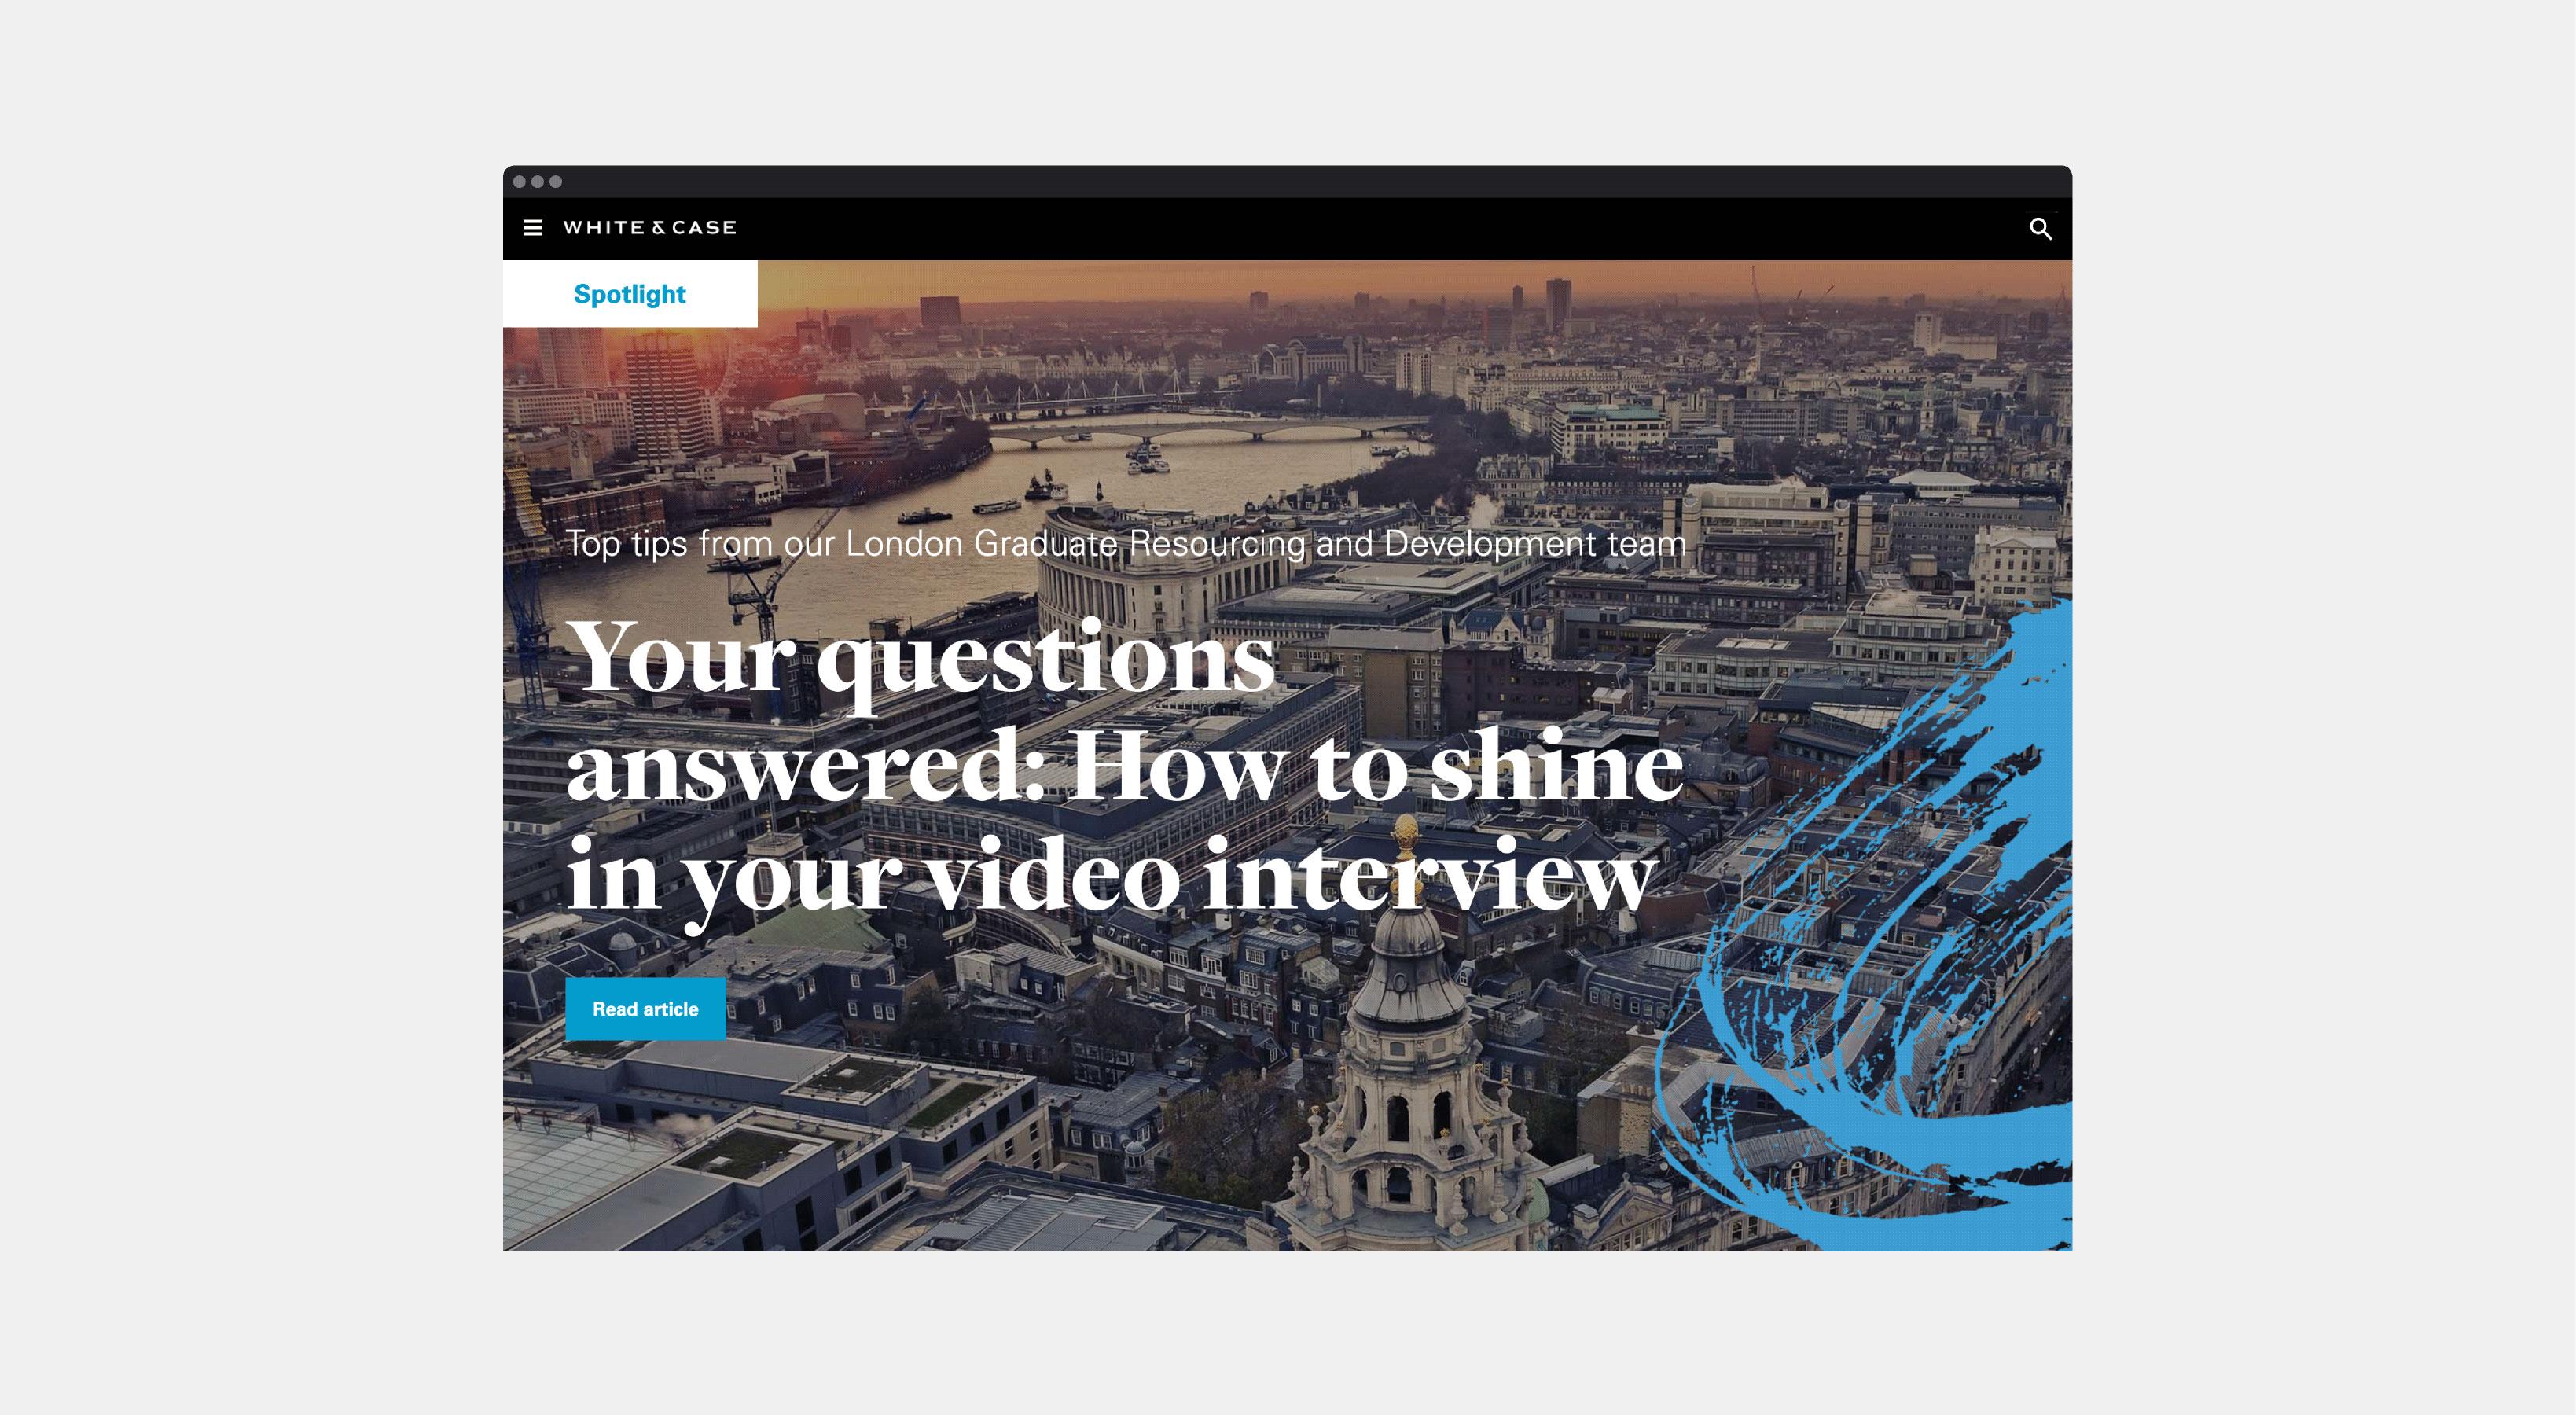 Inside White & Case website design preview